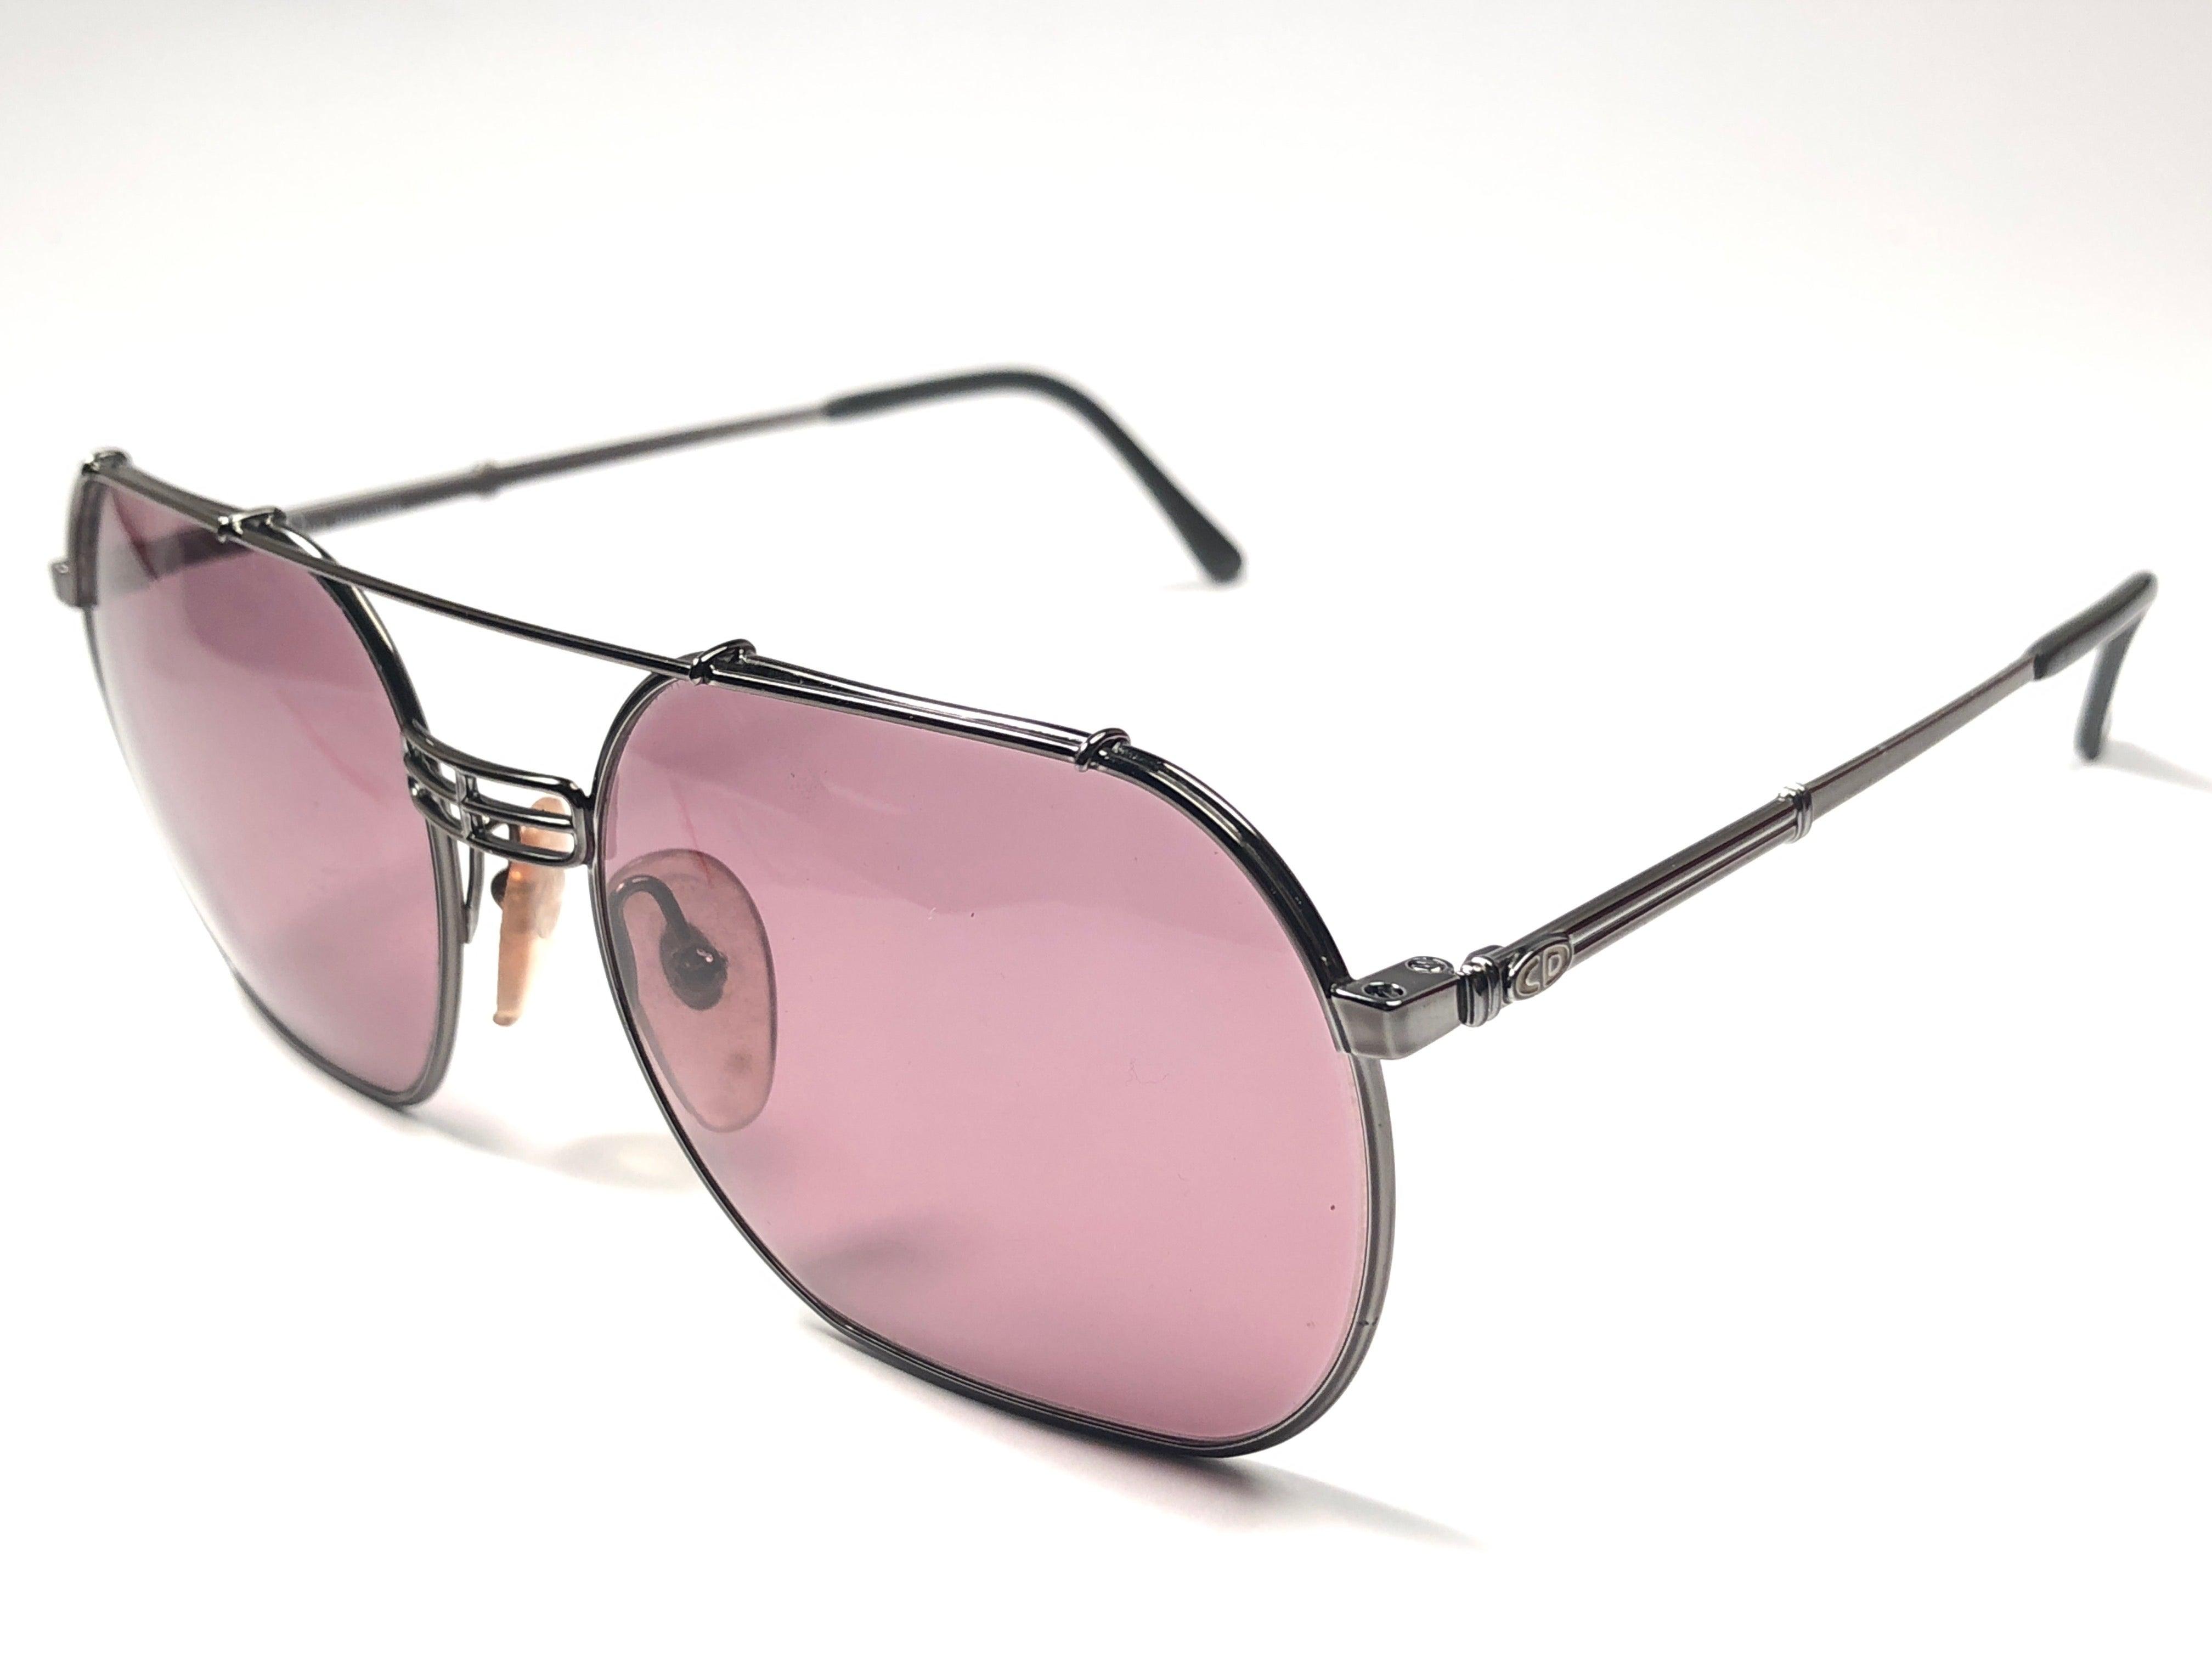 993ec2695ac New Vintage Christian Dior Monsieur 2363 Gun Metal Sunglasses 1970 s Austria  For Sale at 1stdibs